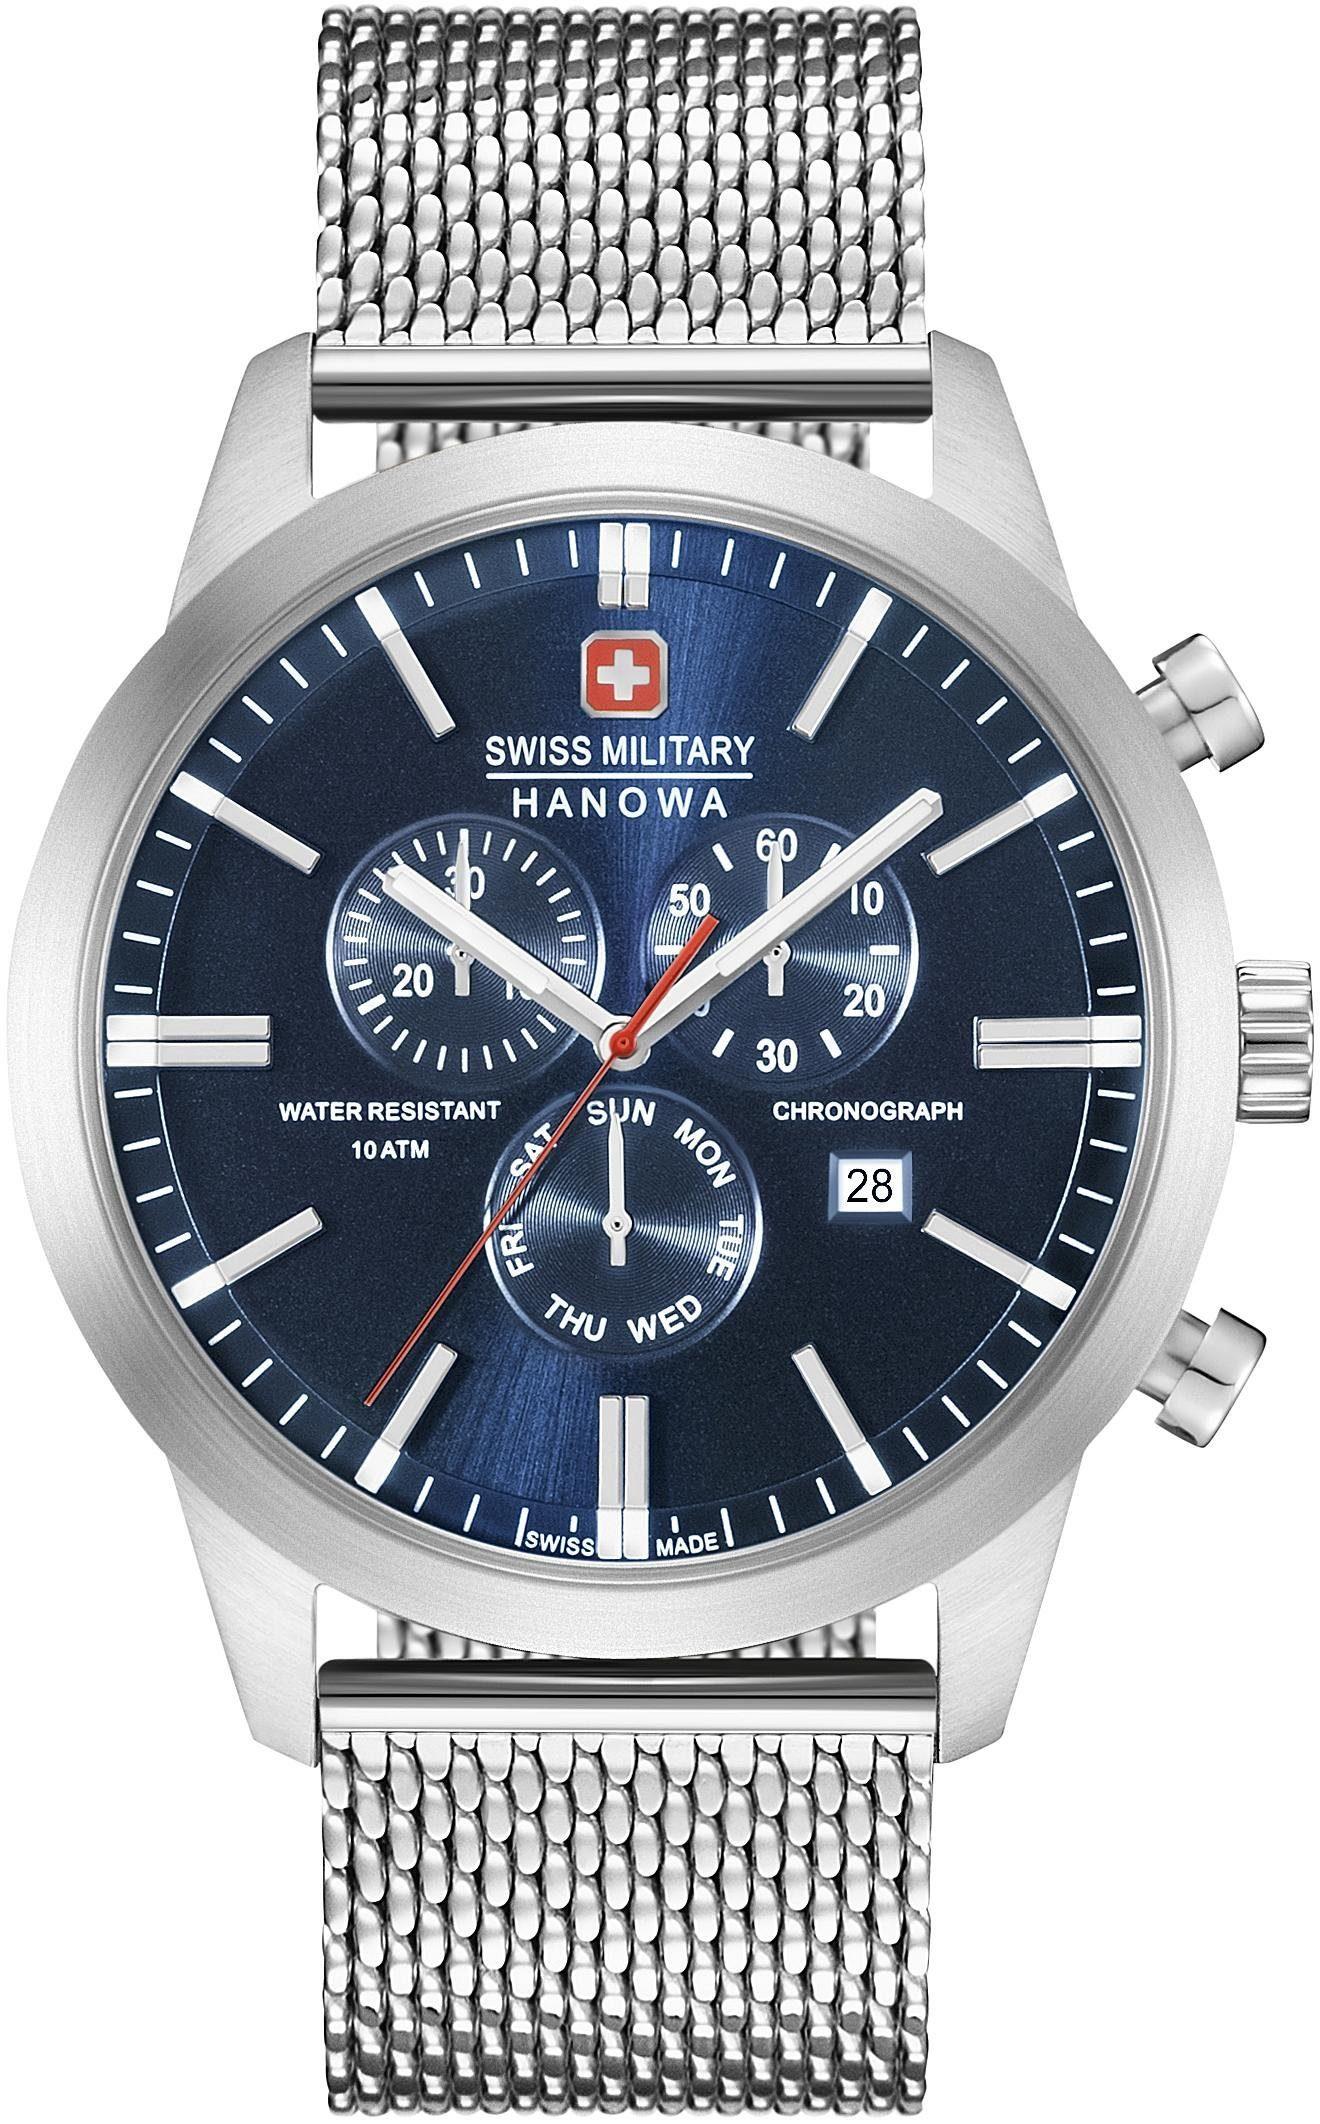 Swiss Military Hanowa Schweizer Uhr »Chrono Classic Mesh, 06-3308.04.003« mit kleiner Sekunde